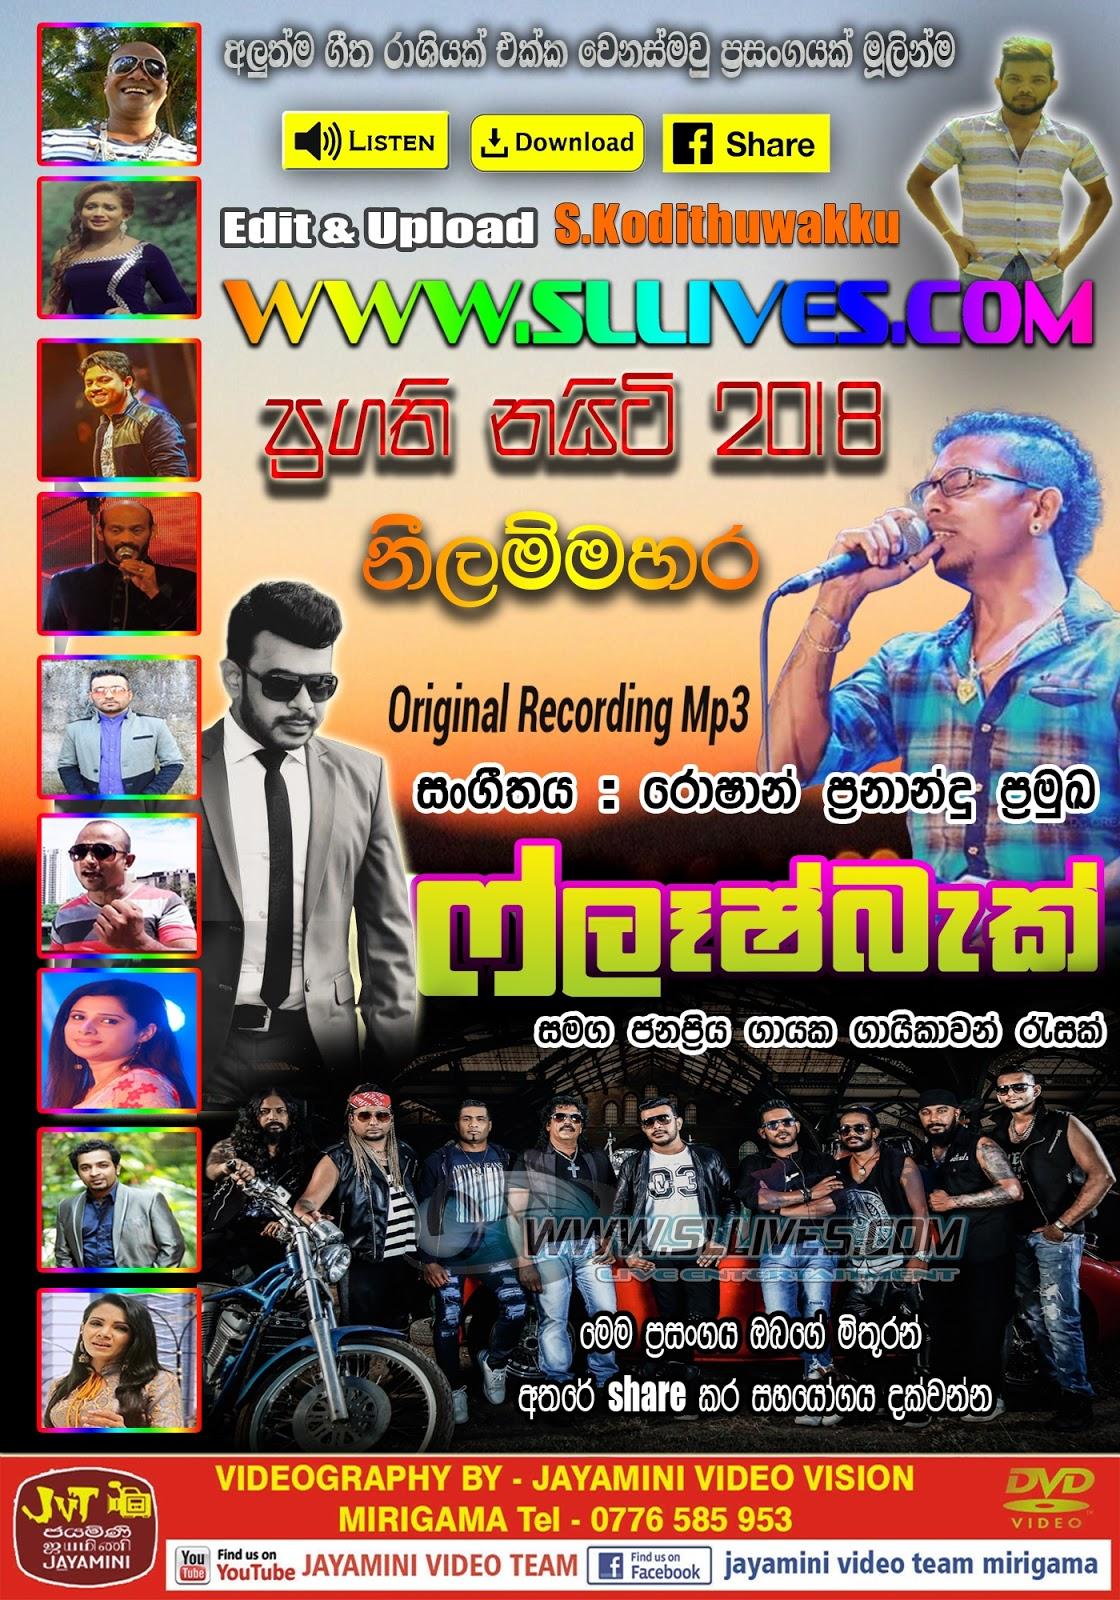 Flash Back Live In Neelammahara 2018 Www Sllives Com